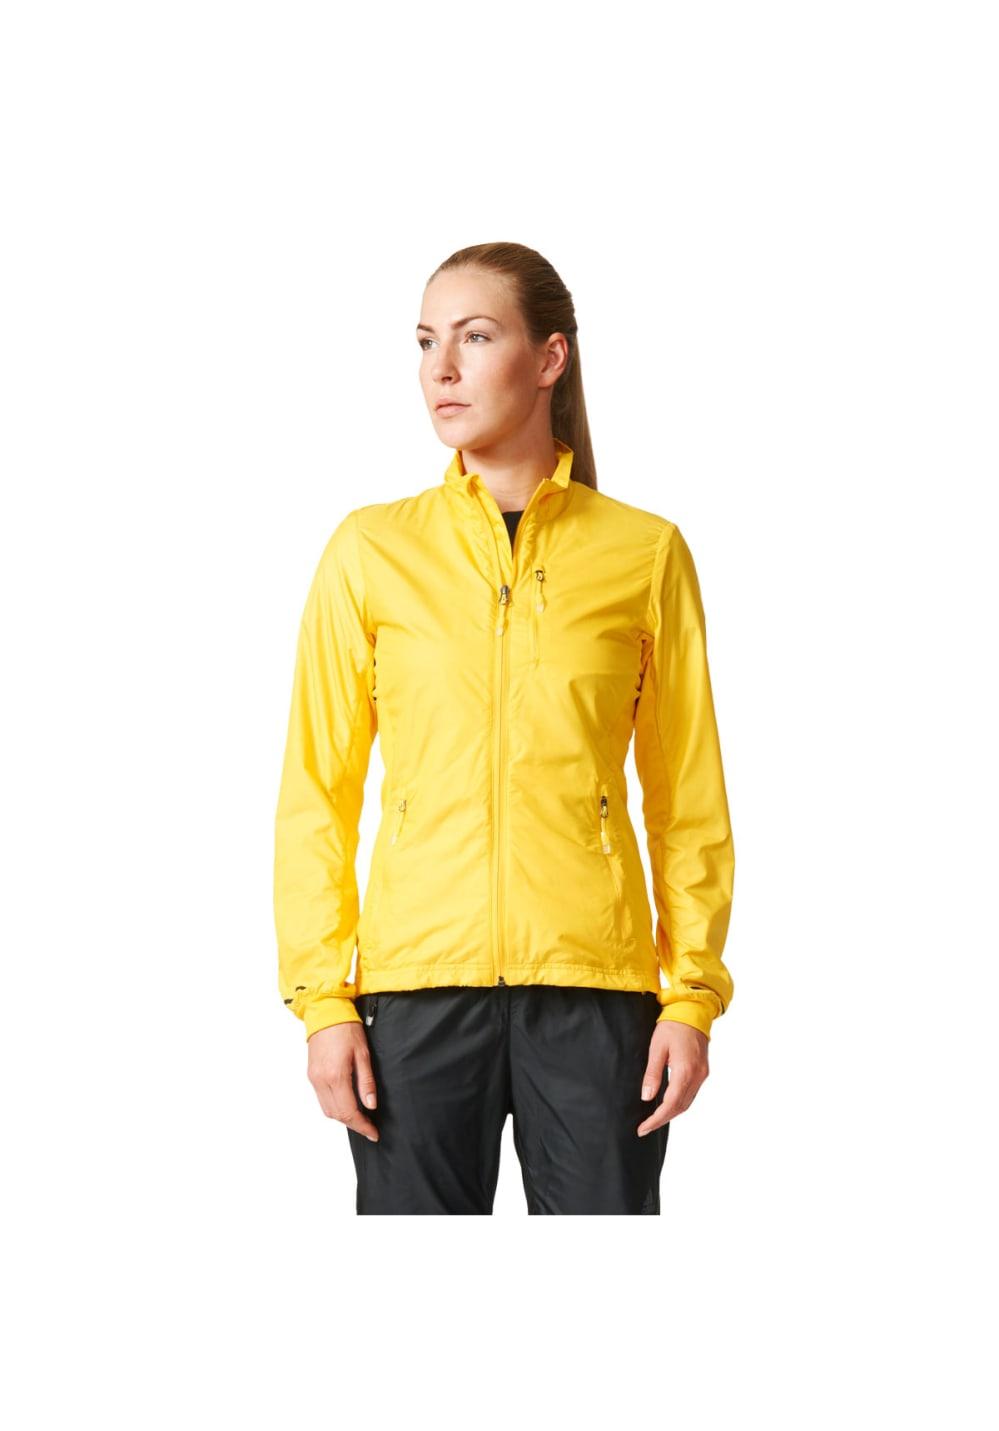 Course W Fast Jacket Pour Vestes Femme Jaune Adidas fr Xperior v8Onyw0mN